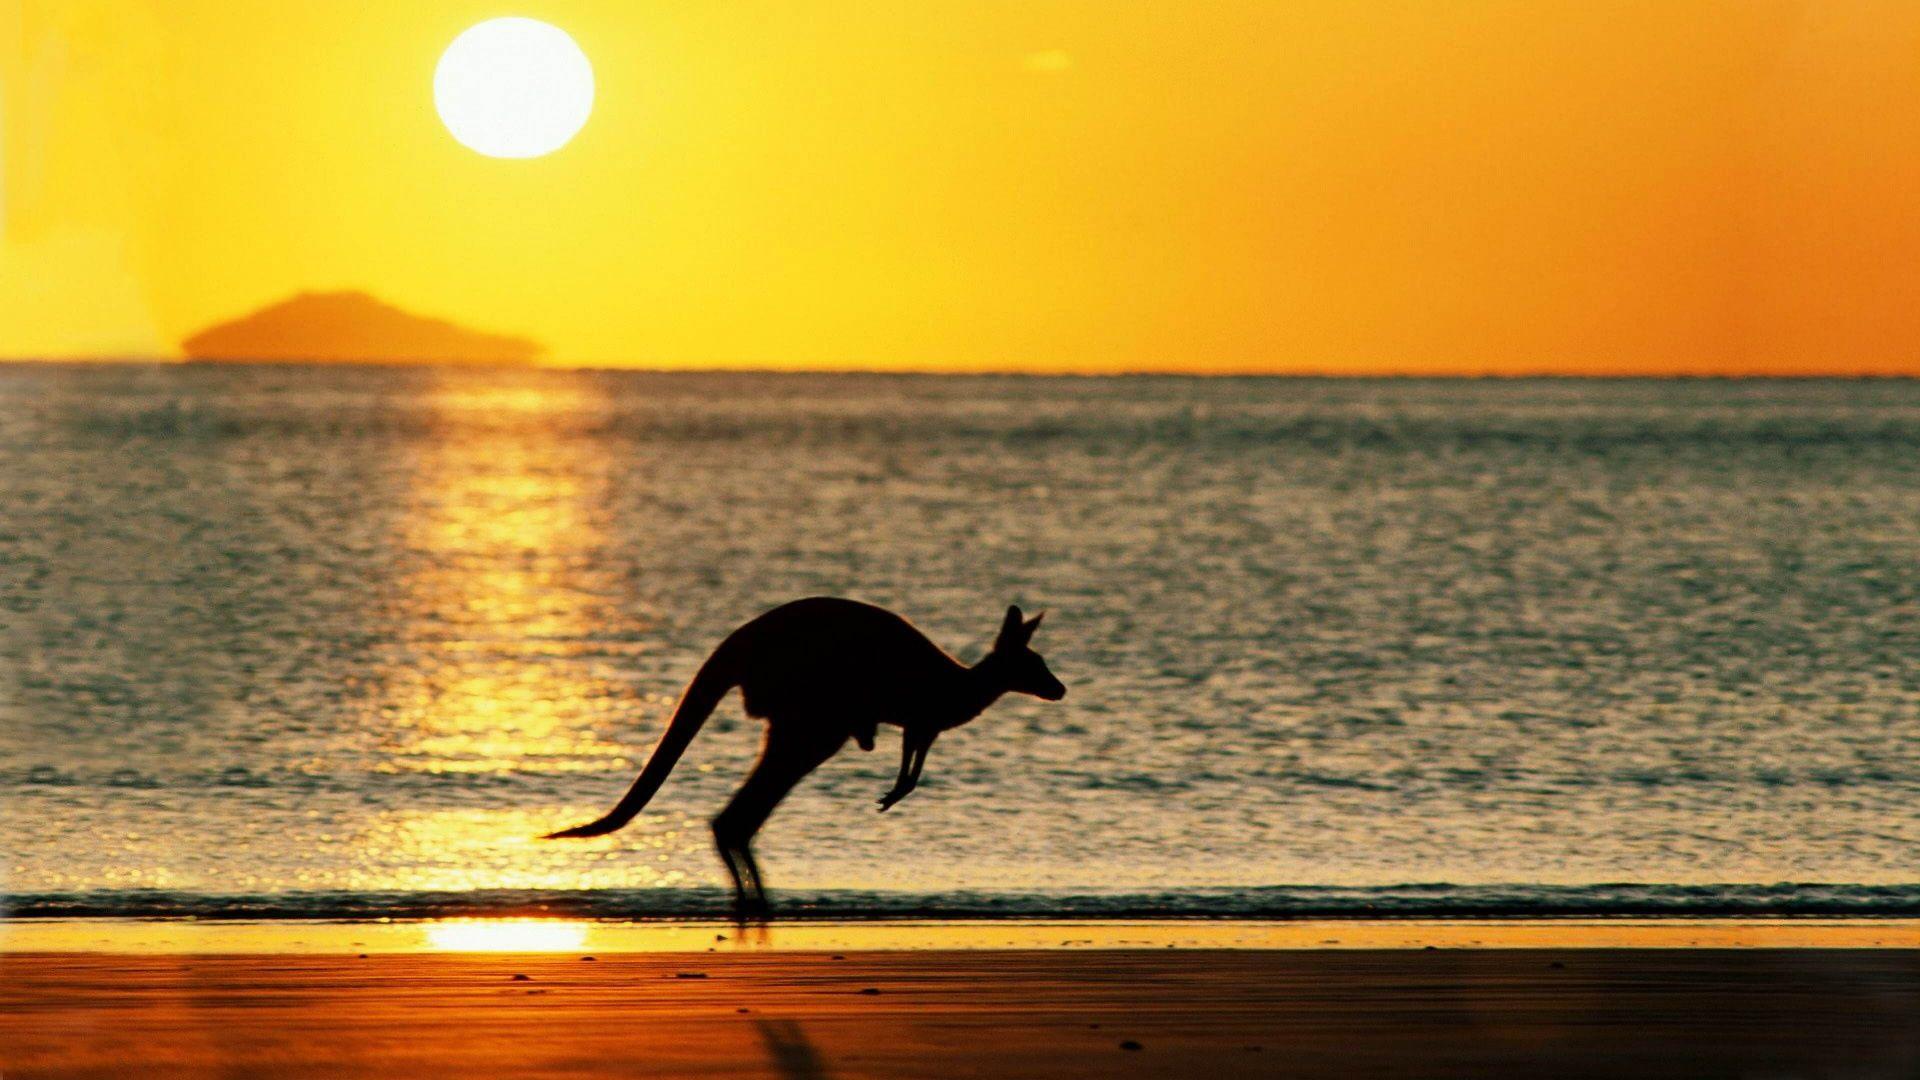 Australia Kangaroo At Sunset